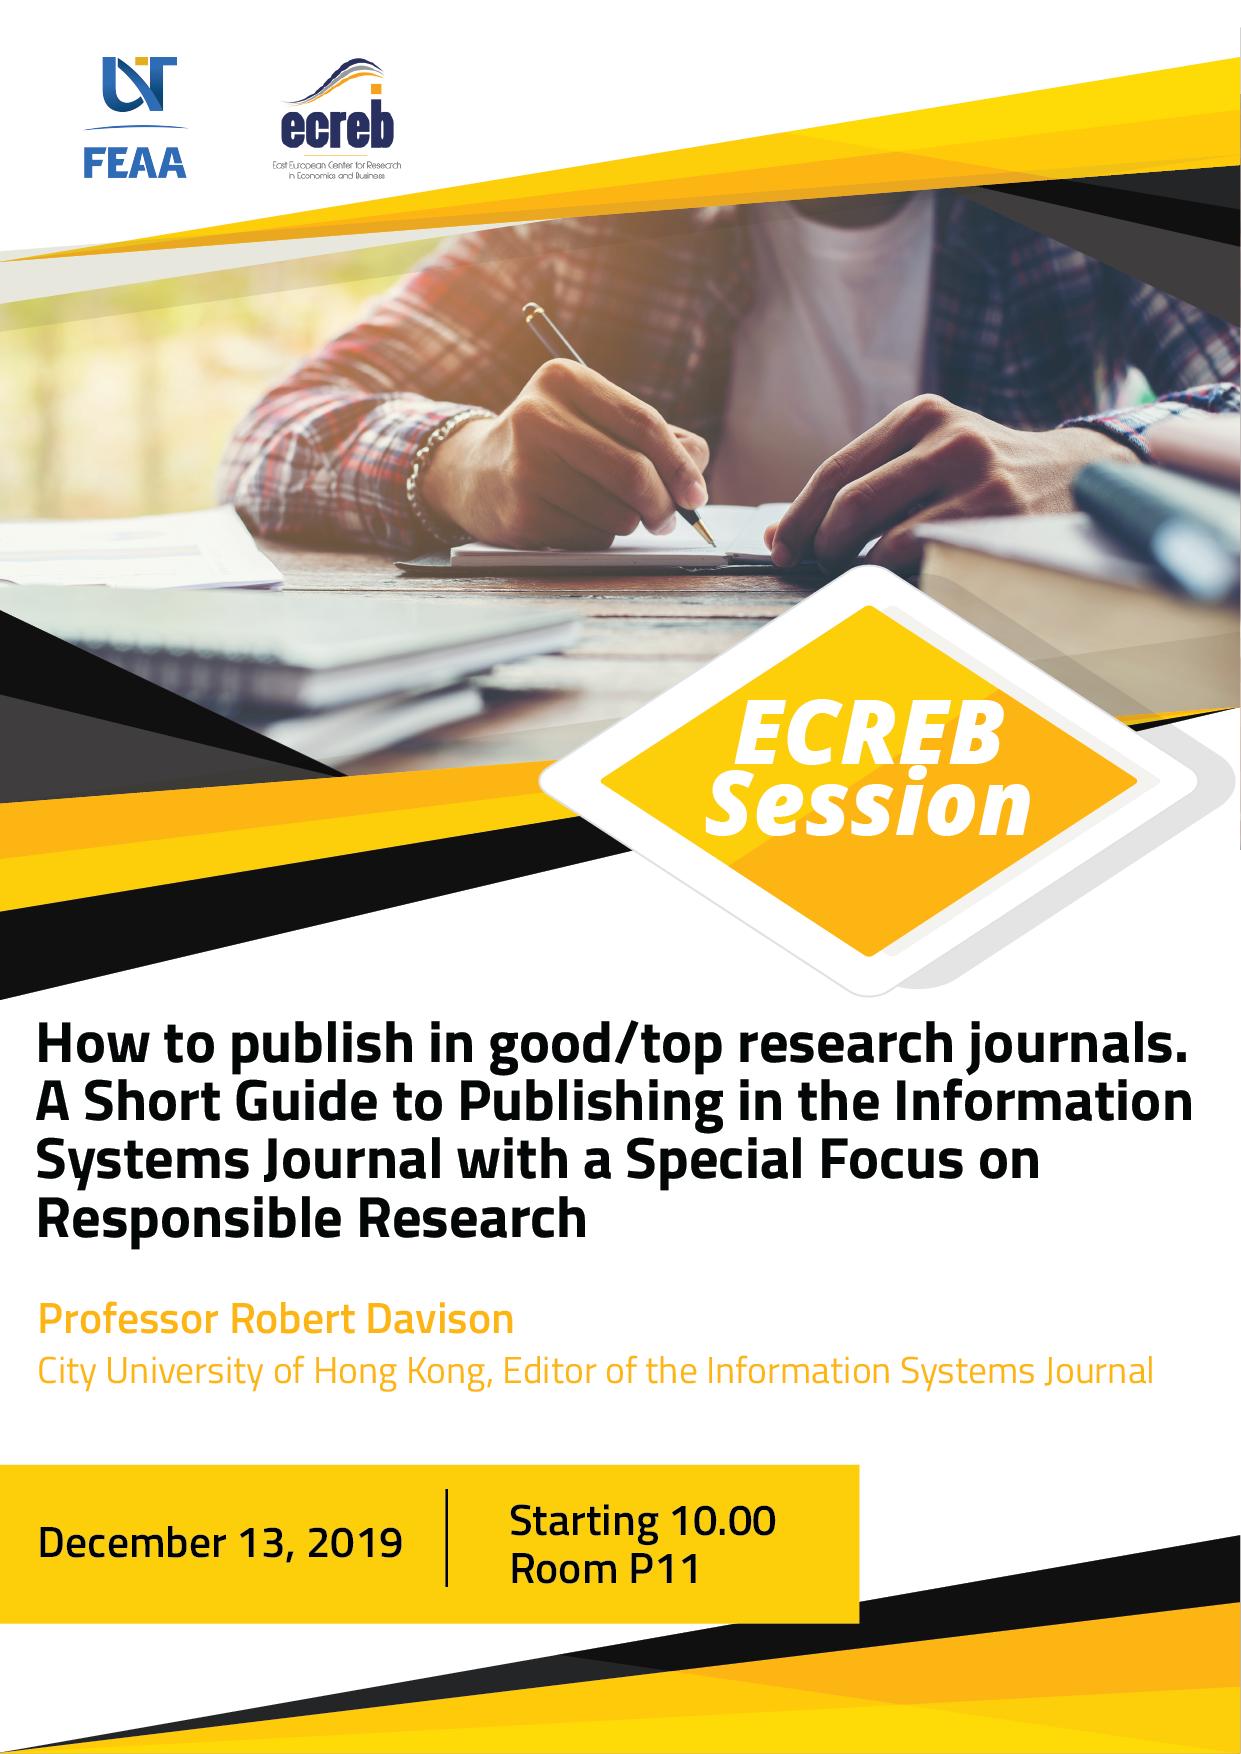 Ecreb Session Professor Robert Davison (2)